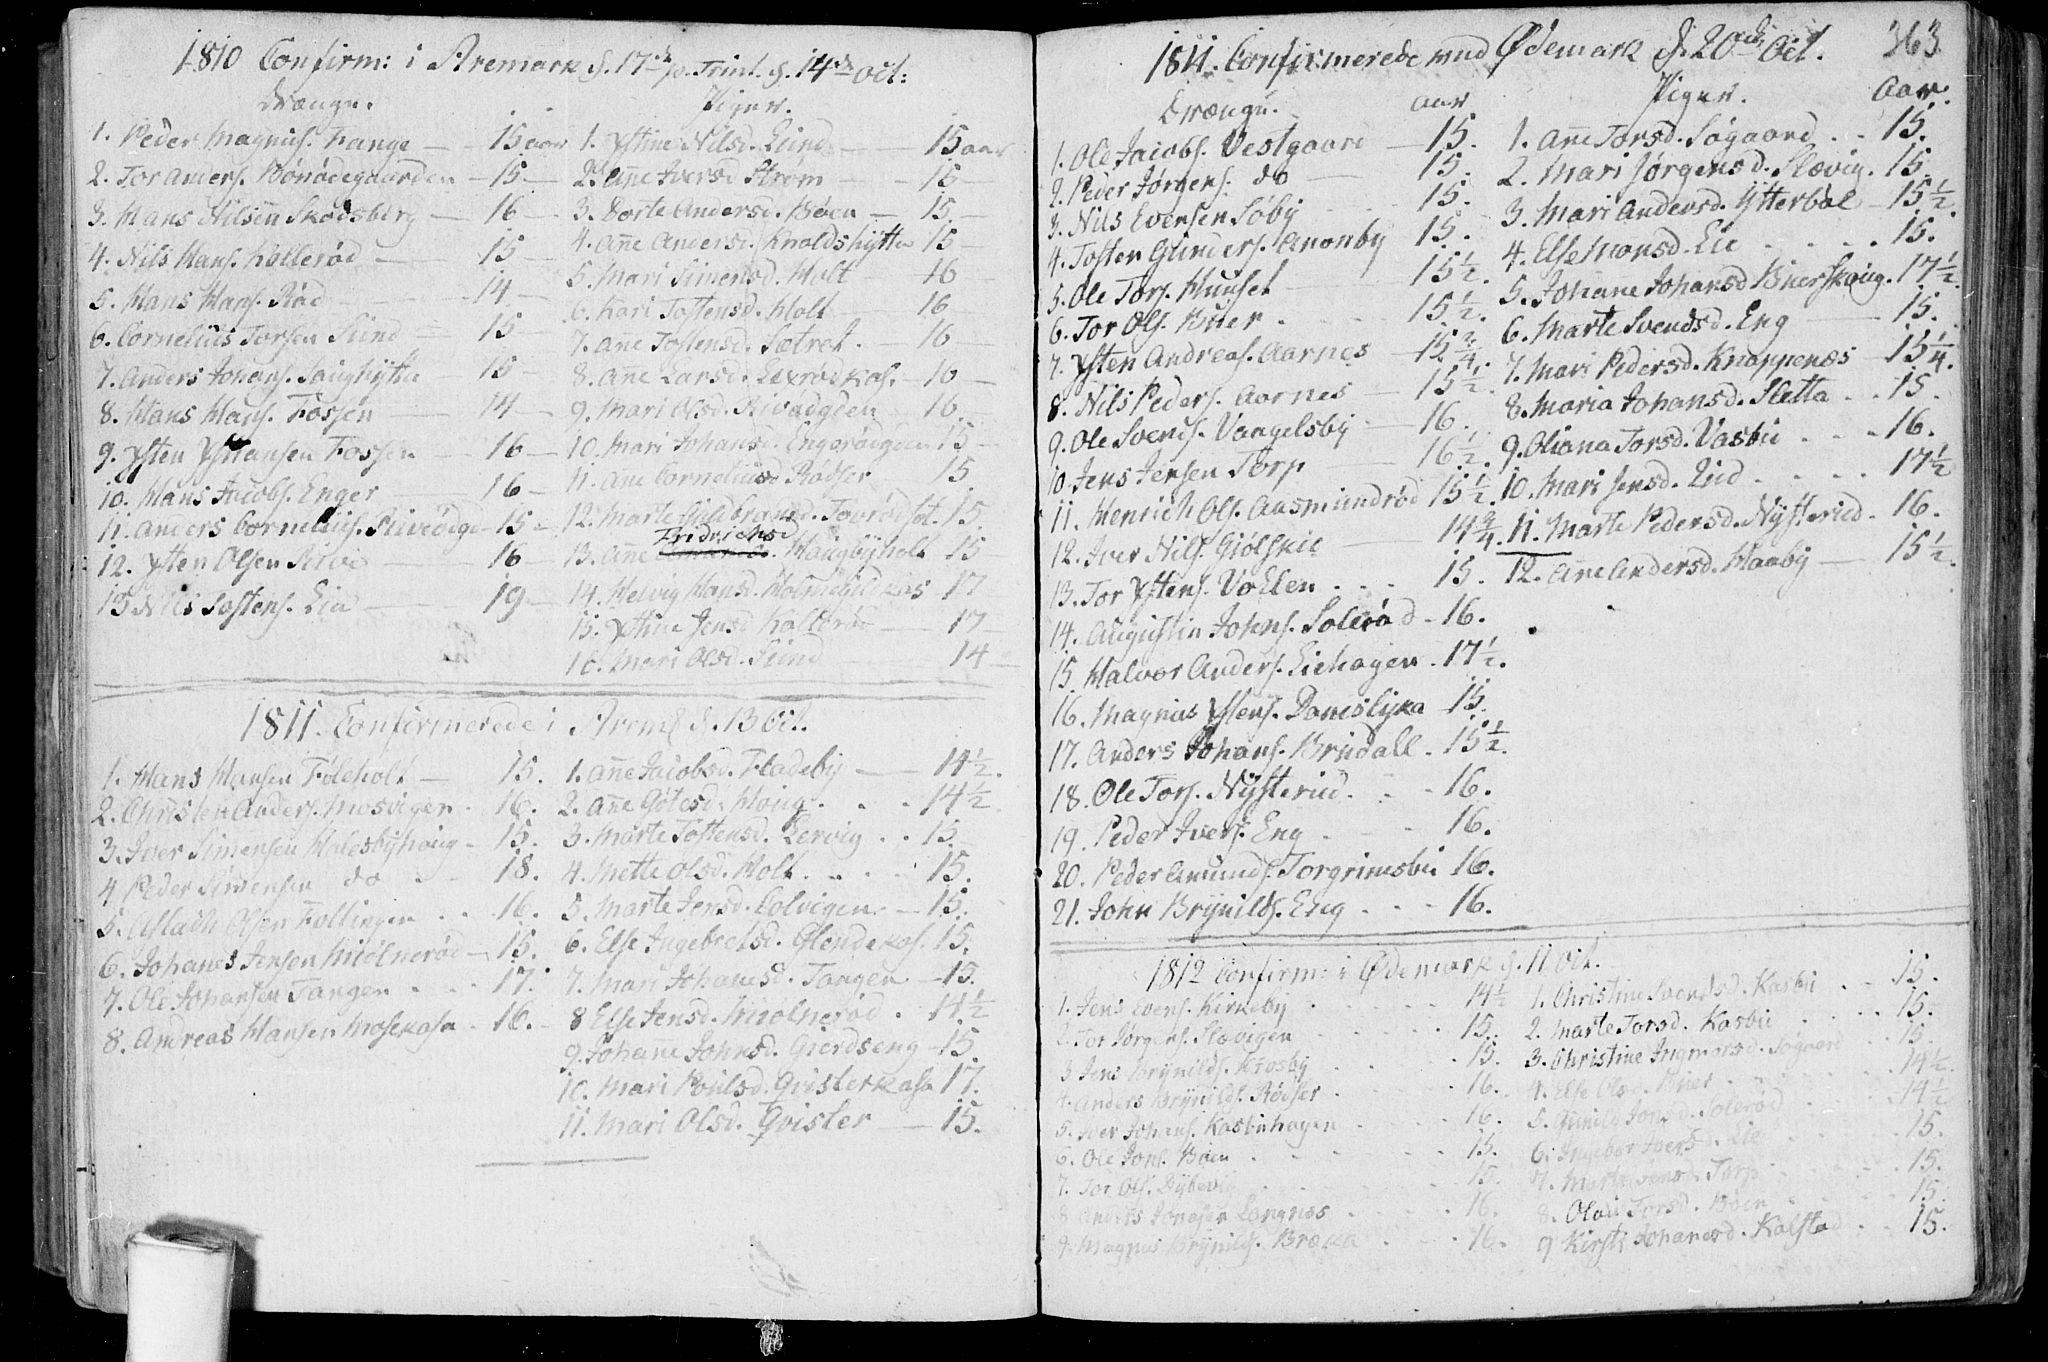 SAO, Aremark prestekontor Kirkebøker, F/Fa/L0004: Ministerialbok nr. I 4, 1796-1814, s. 363